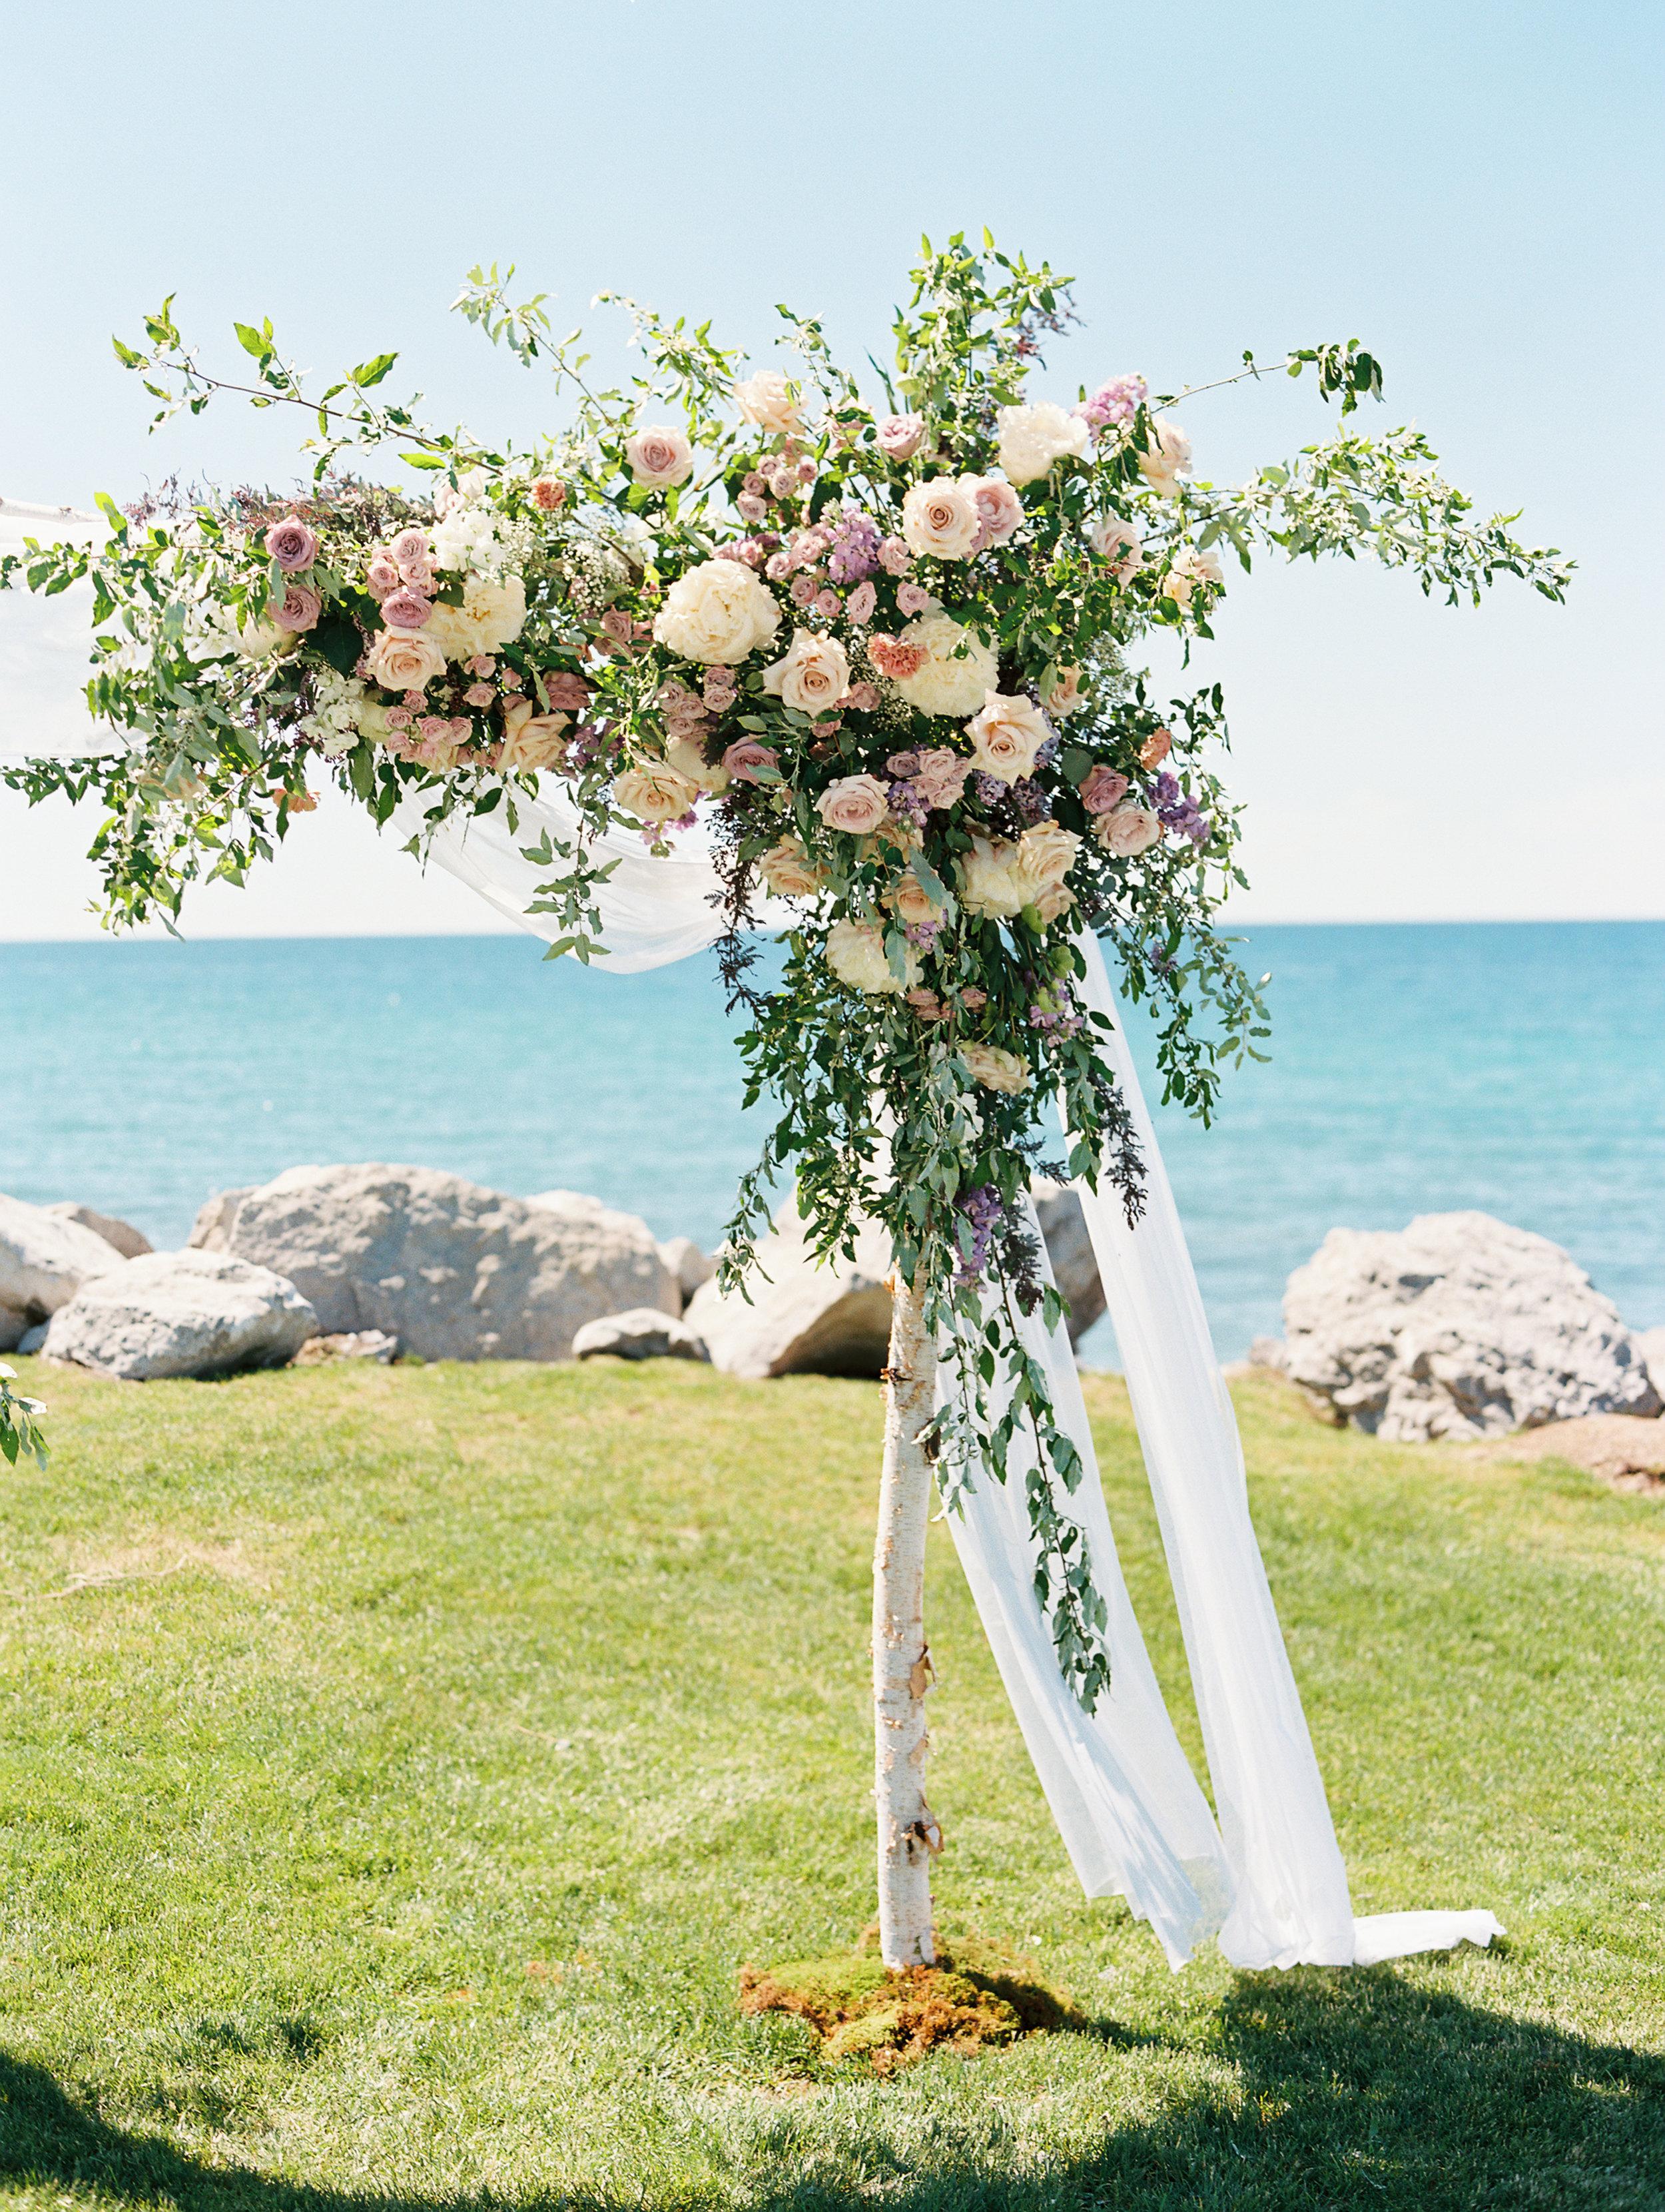 Noss+Wedding+Ceremony-4.jpg